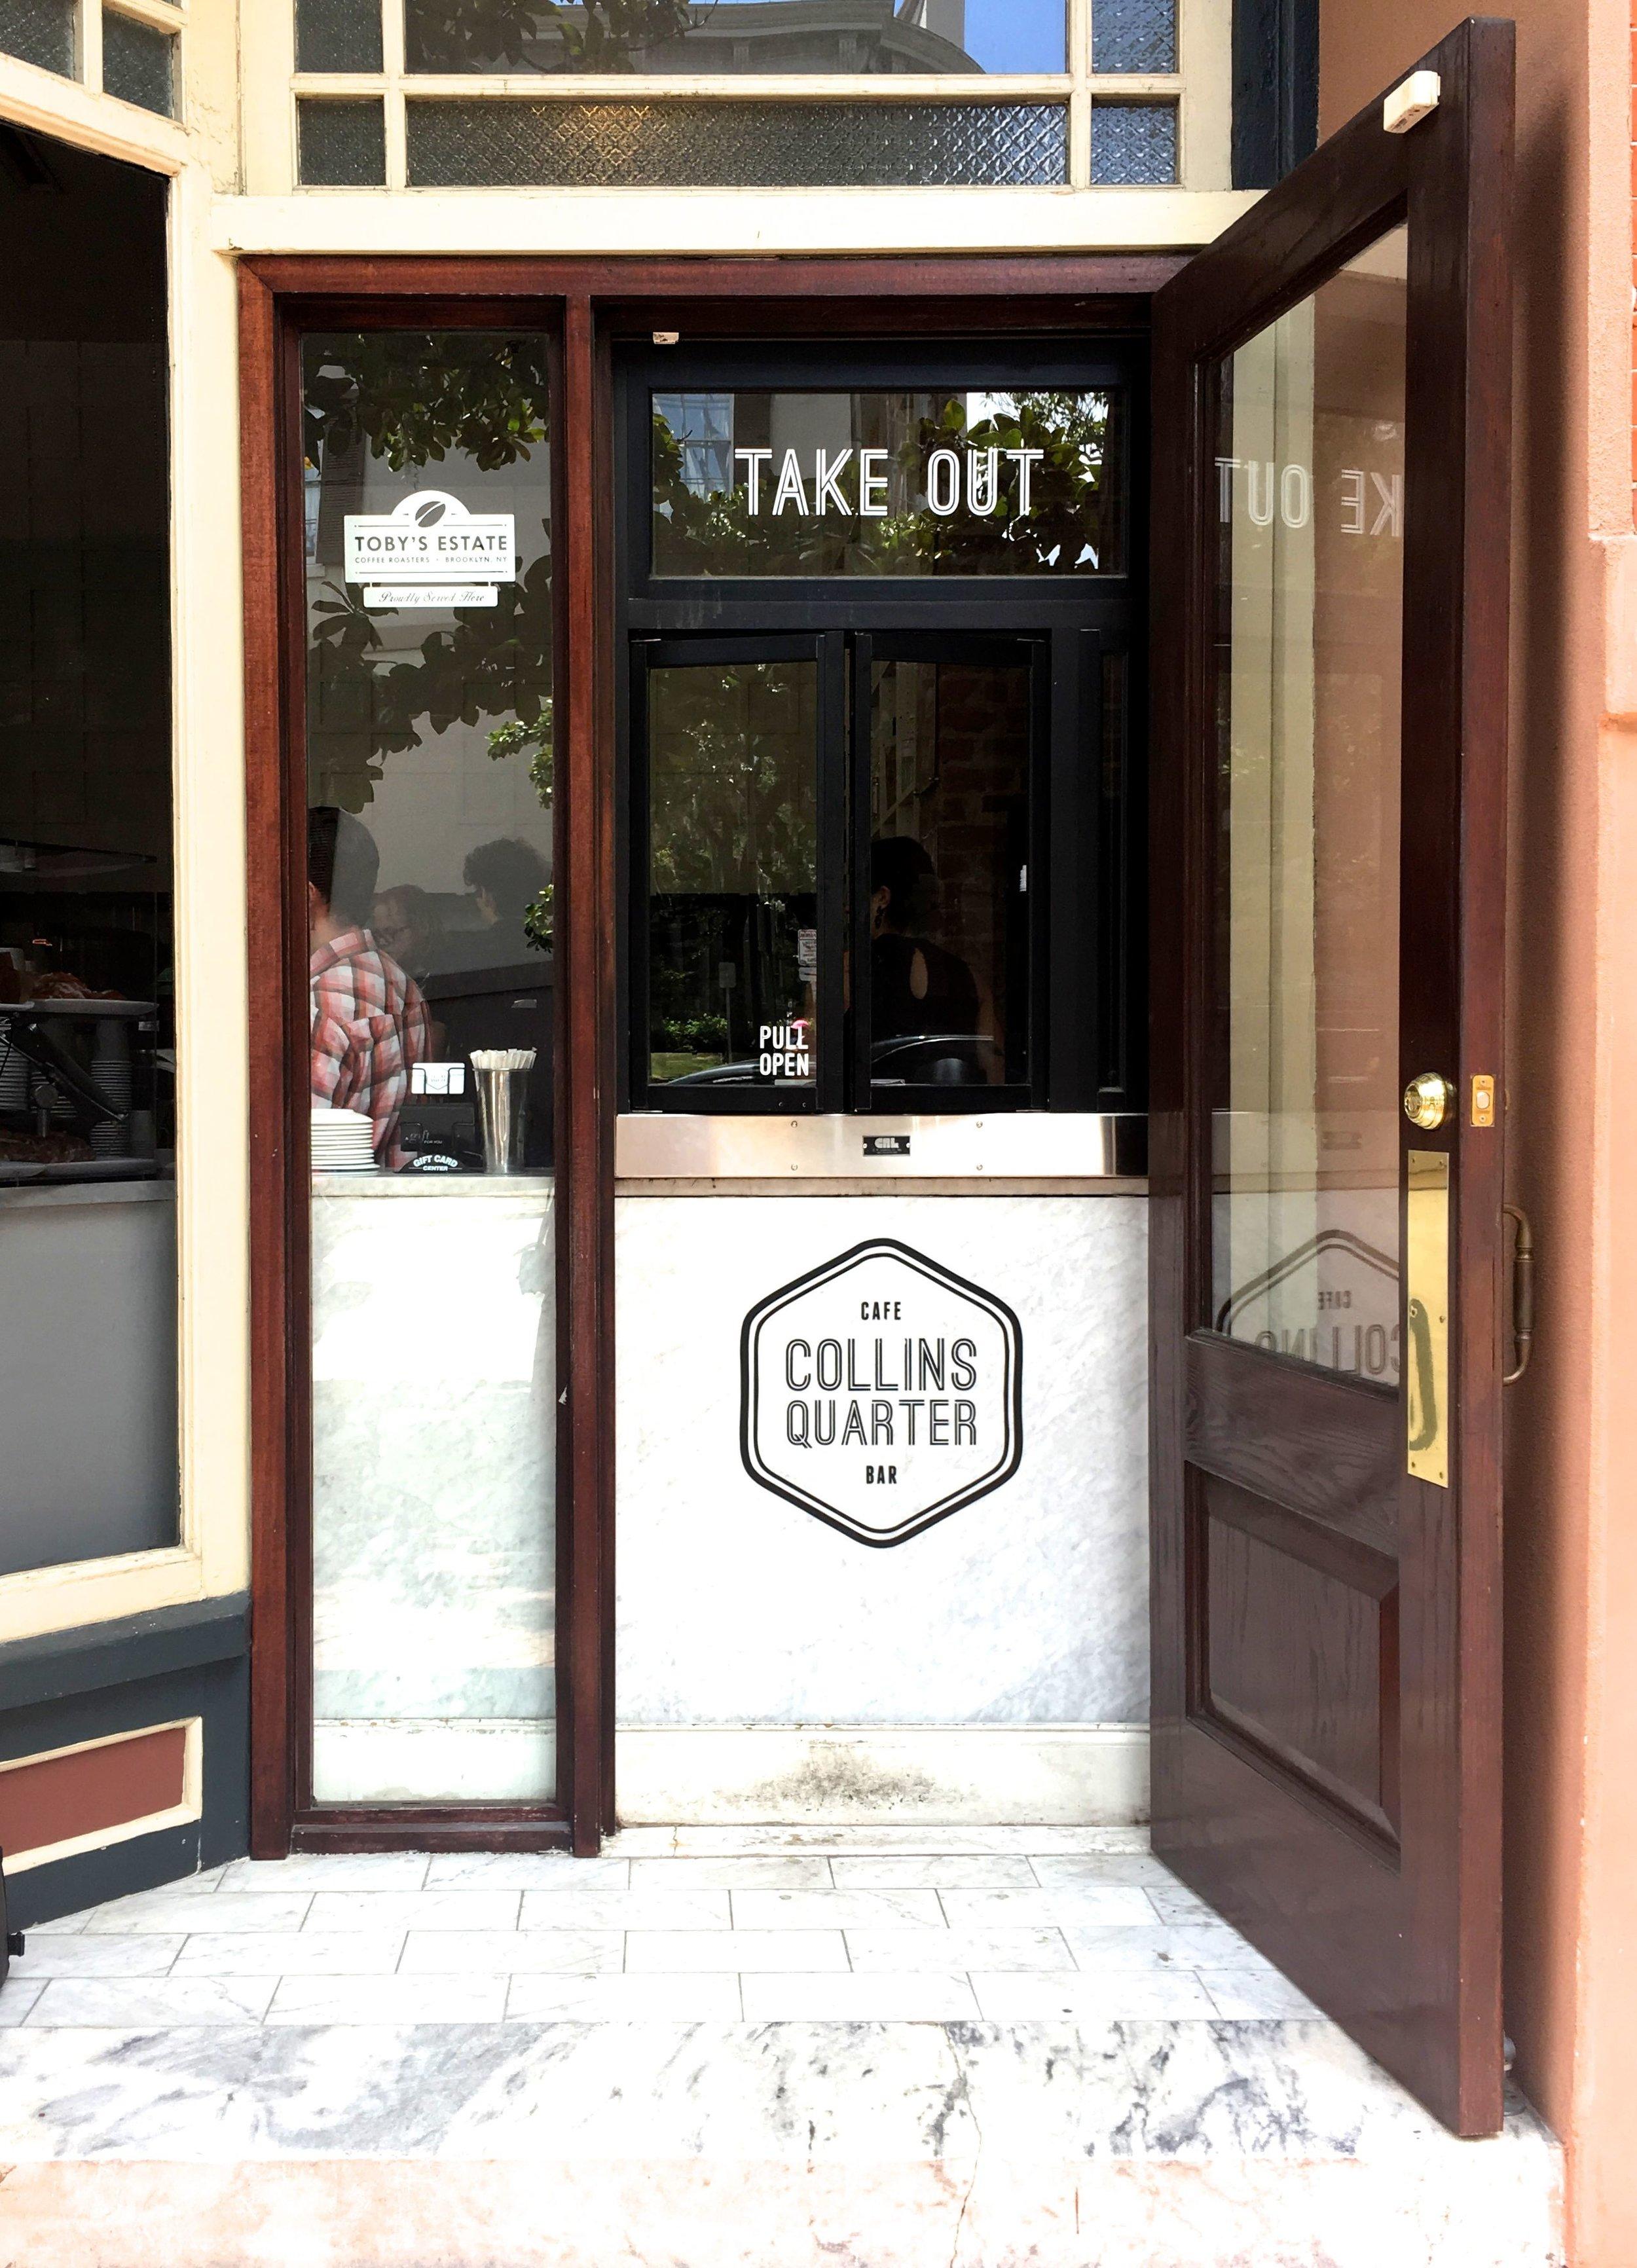 To-gocoffee window. -